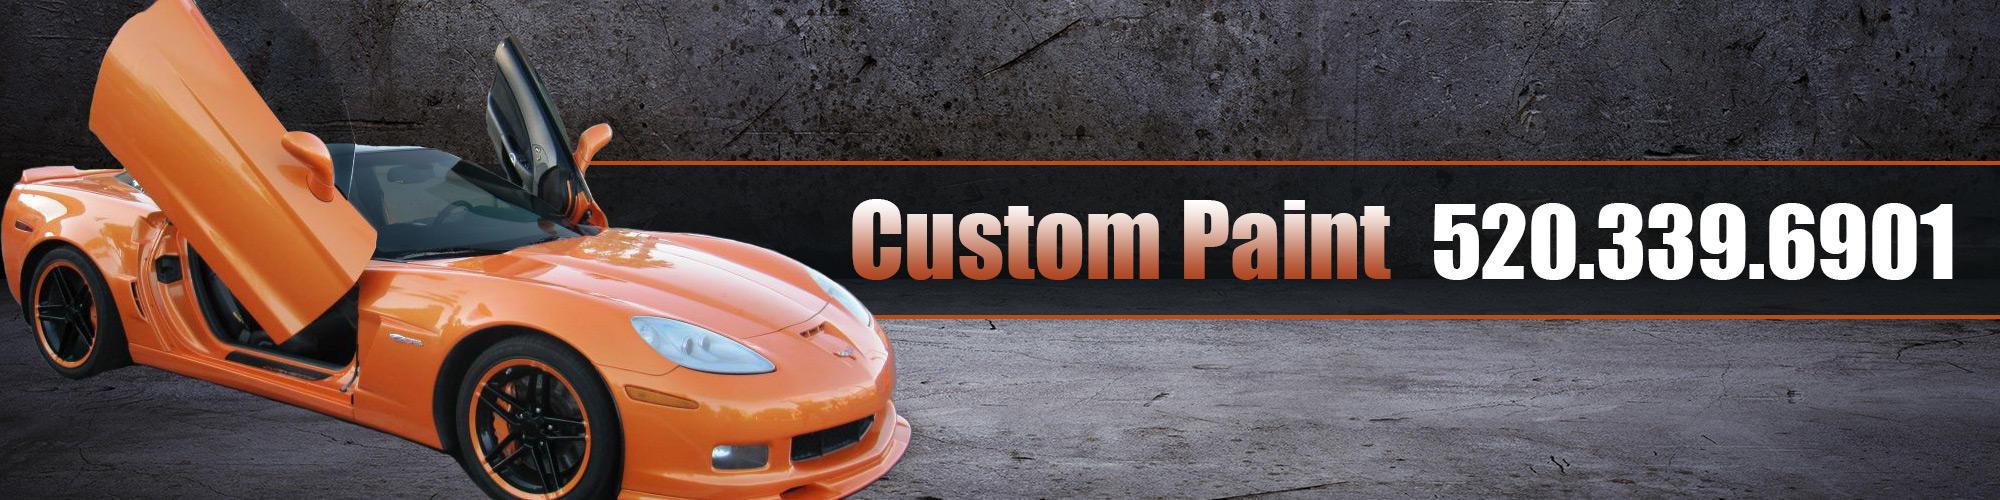 Custom Auto Painting Tucson Az